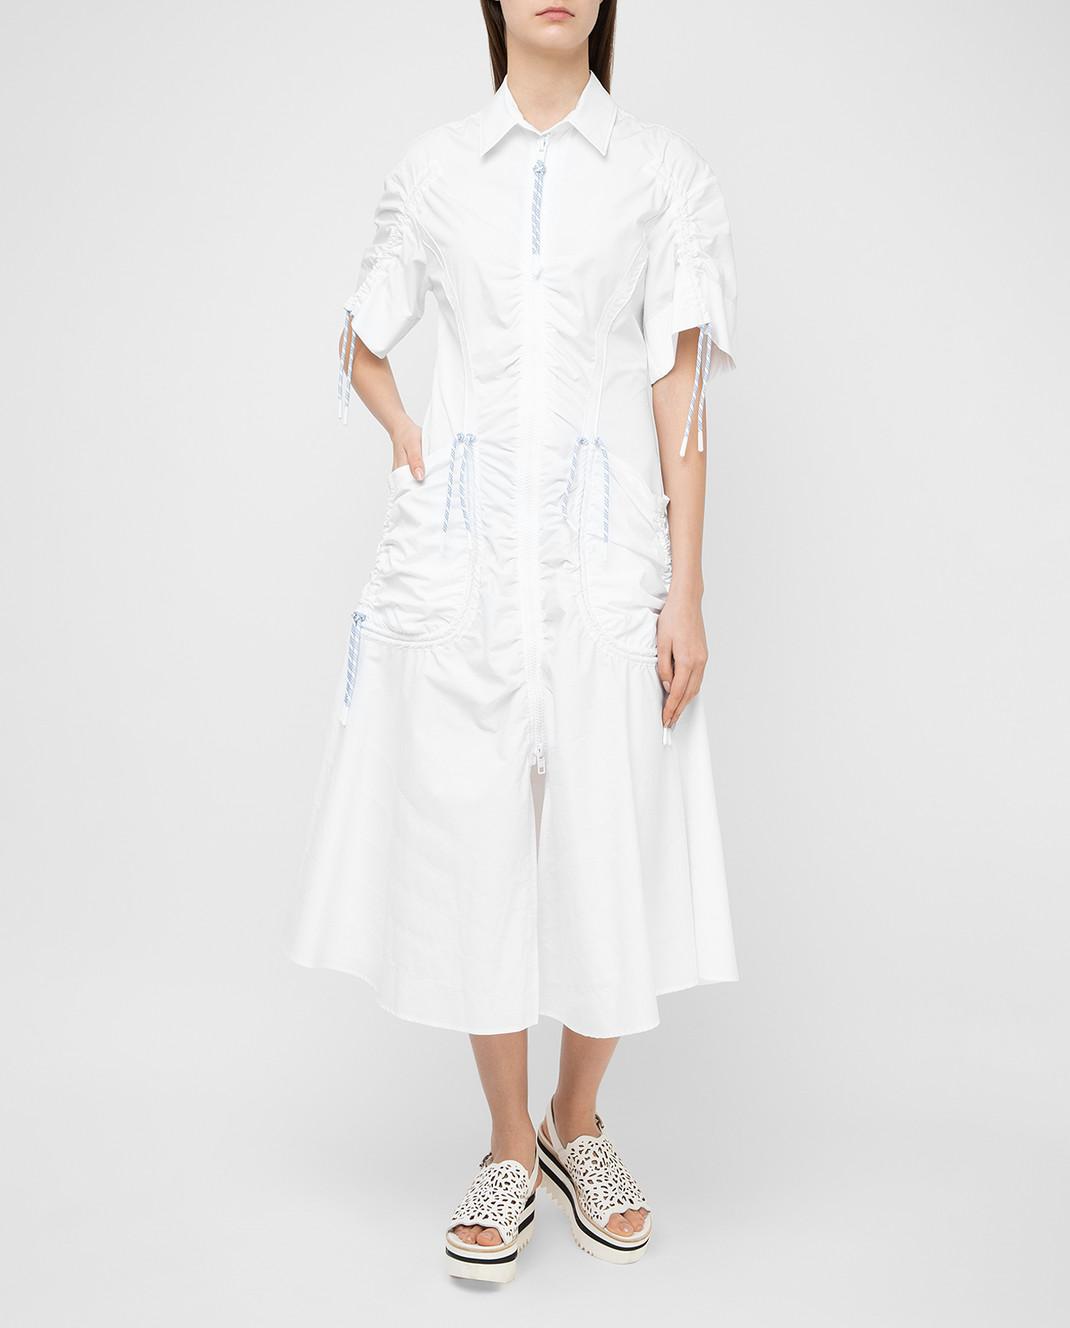 Max Mara Sportmax Белое платье  ELMI изображение 2